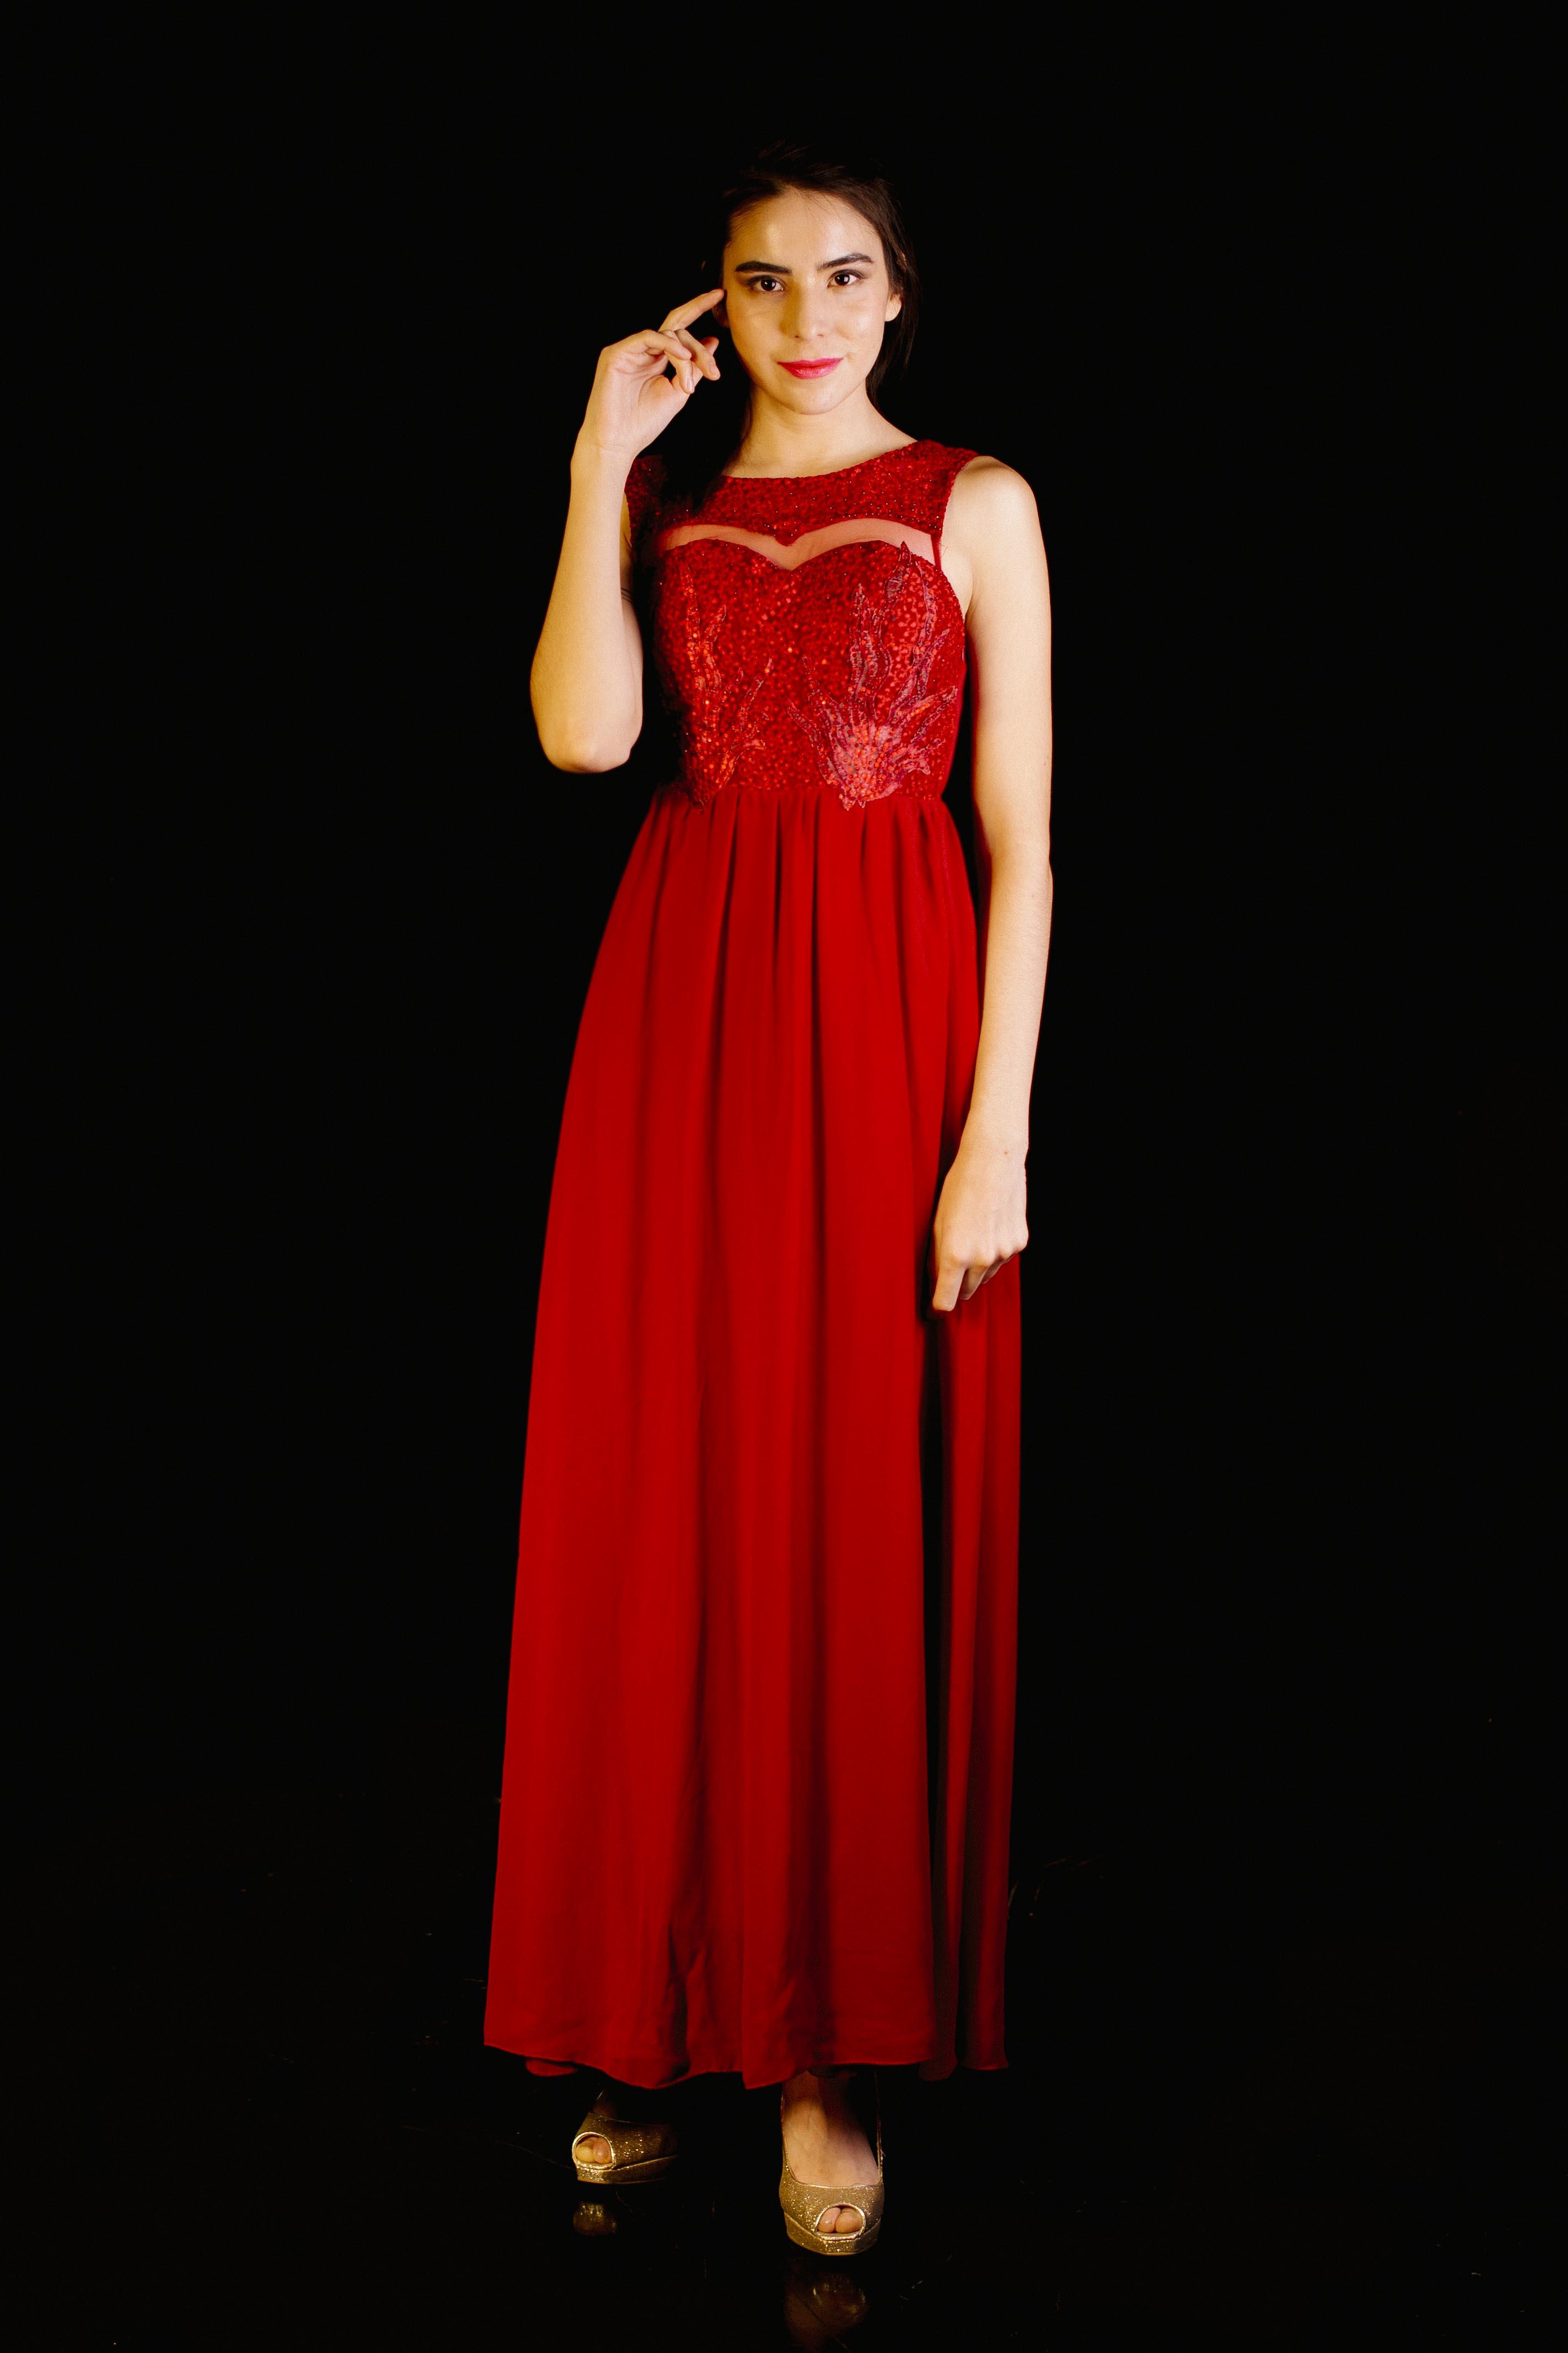 Vestido Lentejuelas Detalle Corazón